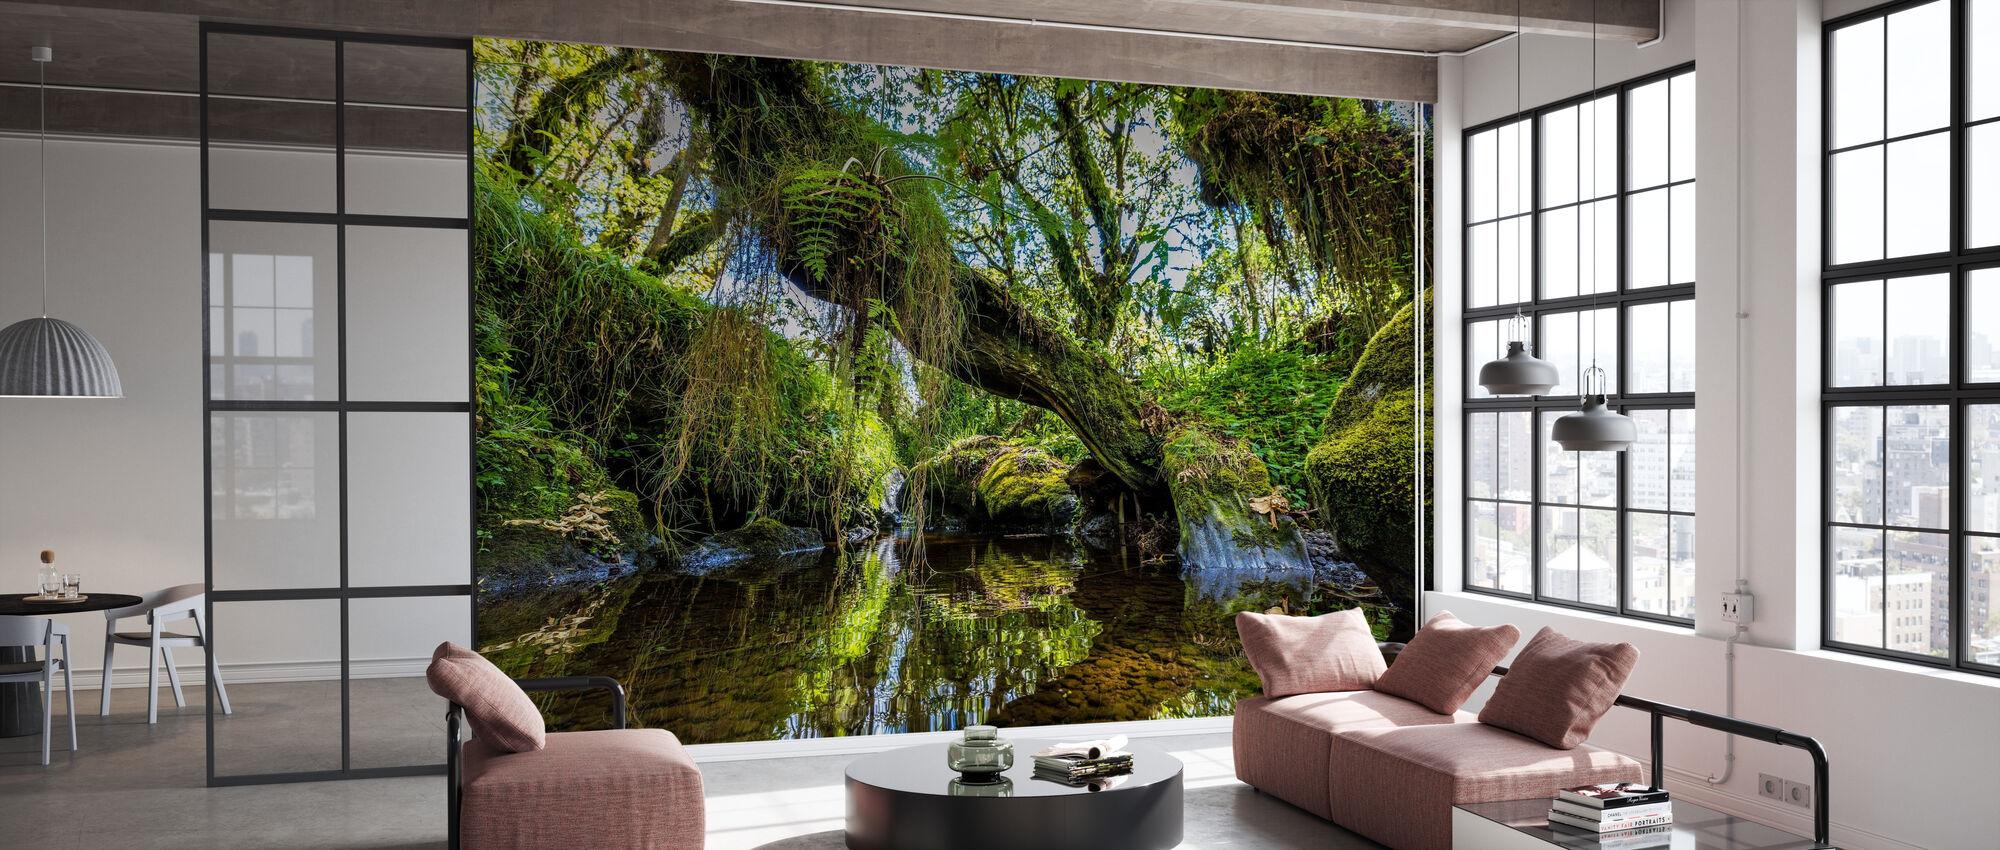 Wetland - Wallpaper - Office